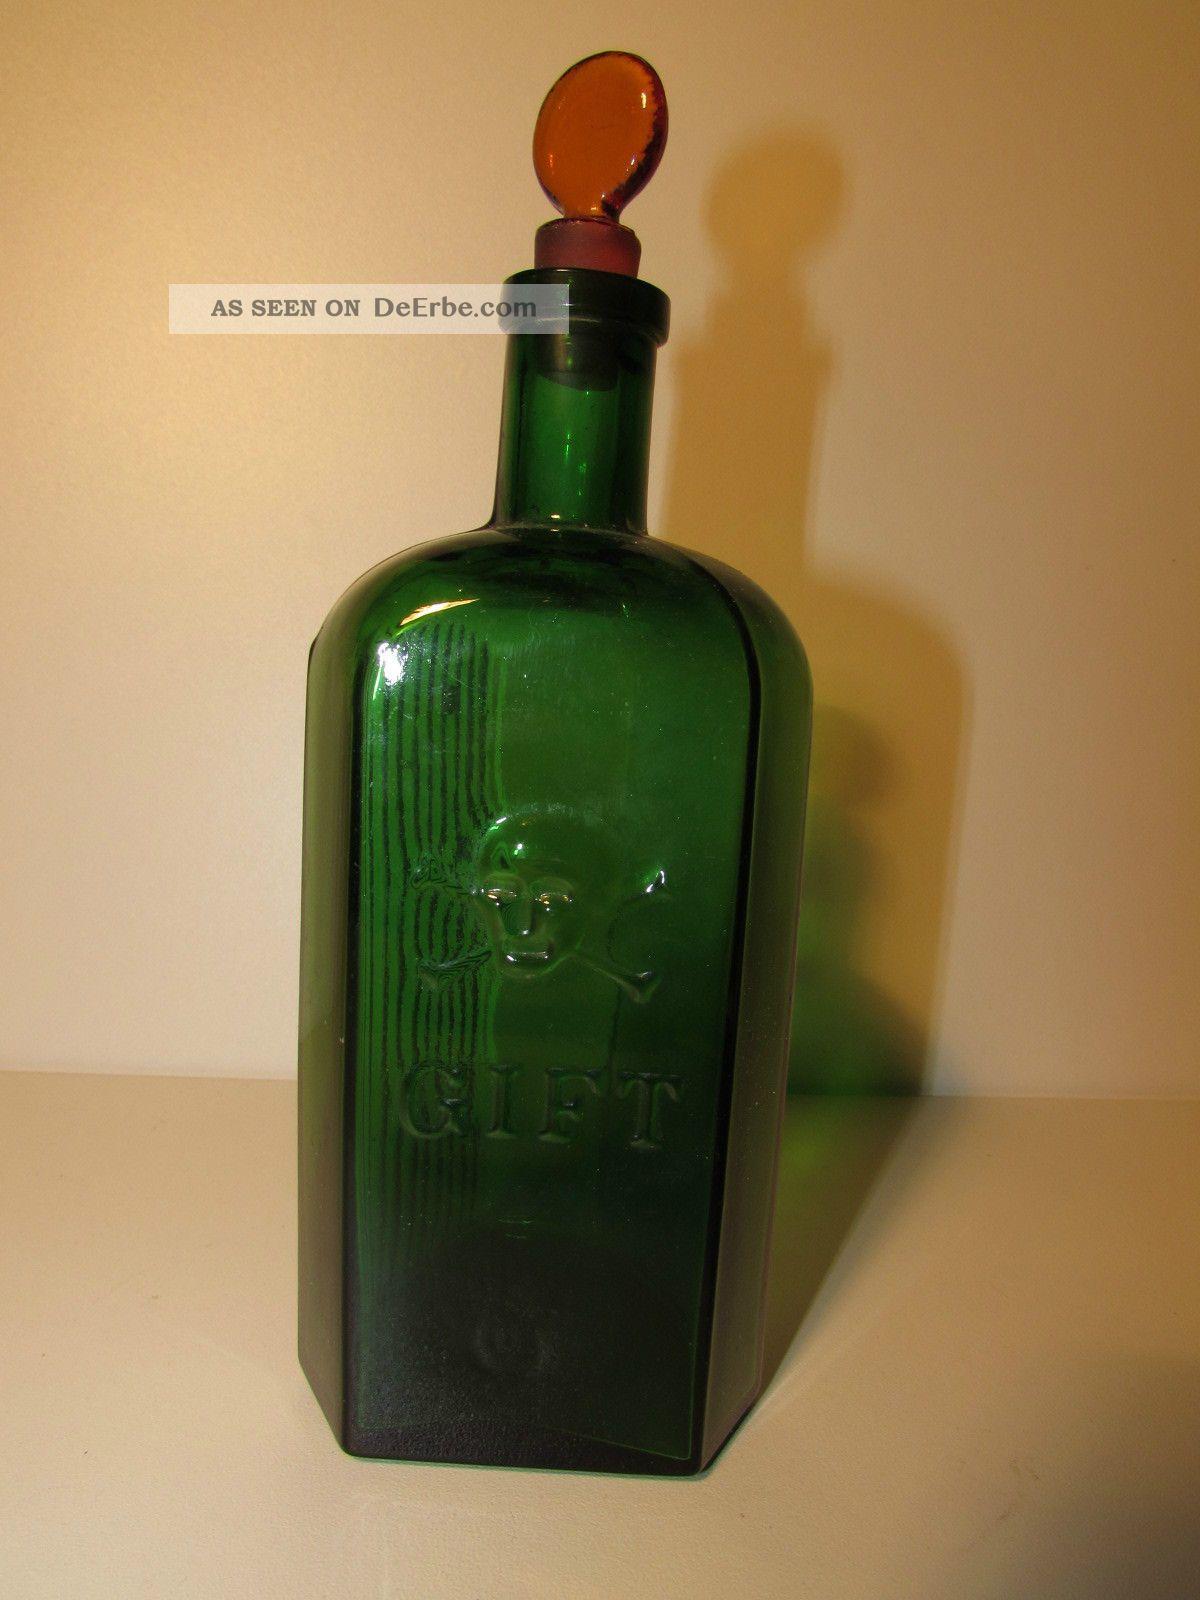 sehr alte totenkopf gift flasche aus glas. Black Bedroom Furniture Sets. Home Design Ideas